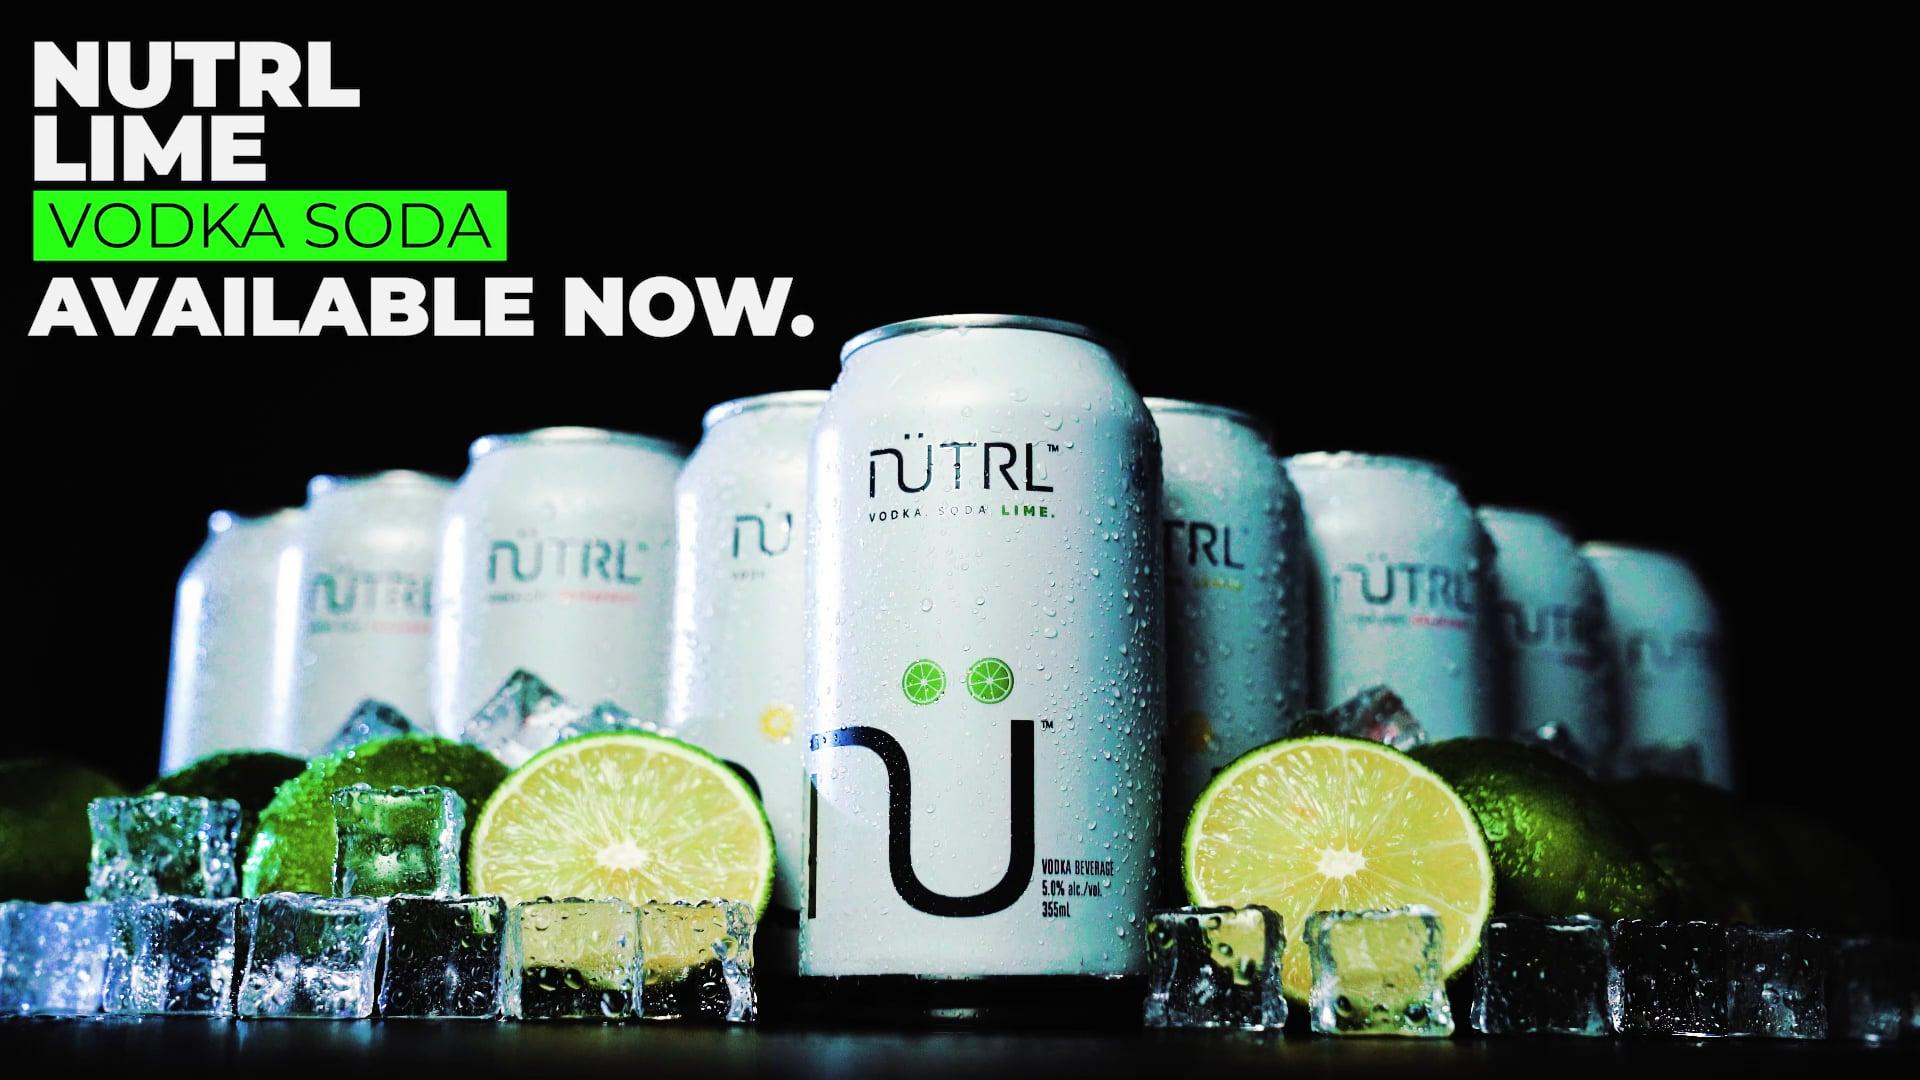 NÜTRL Lime Vodka Soda (Spec Ad)